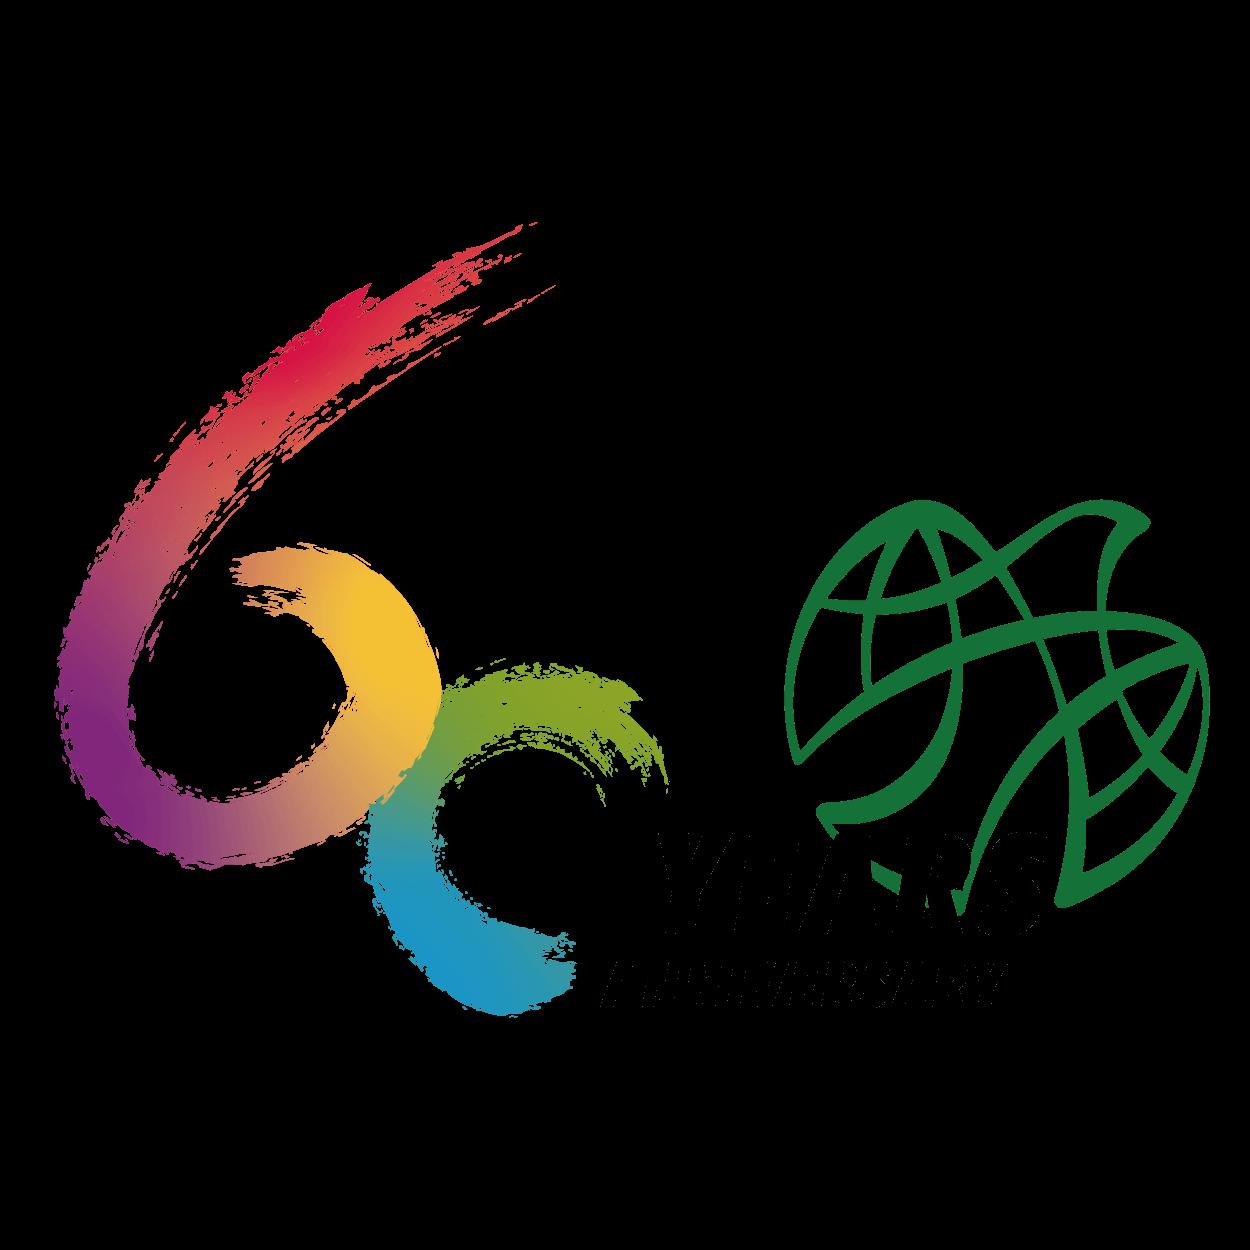 AYP 60th Anniversary logo